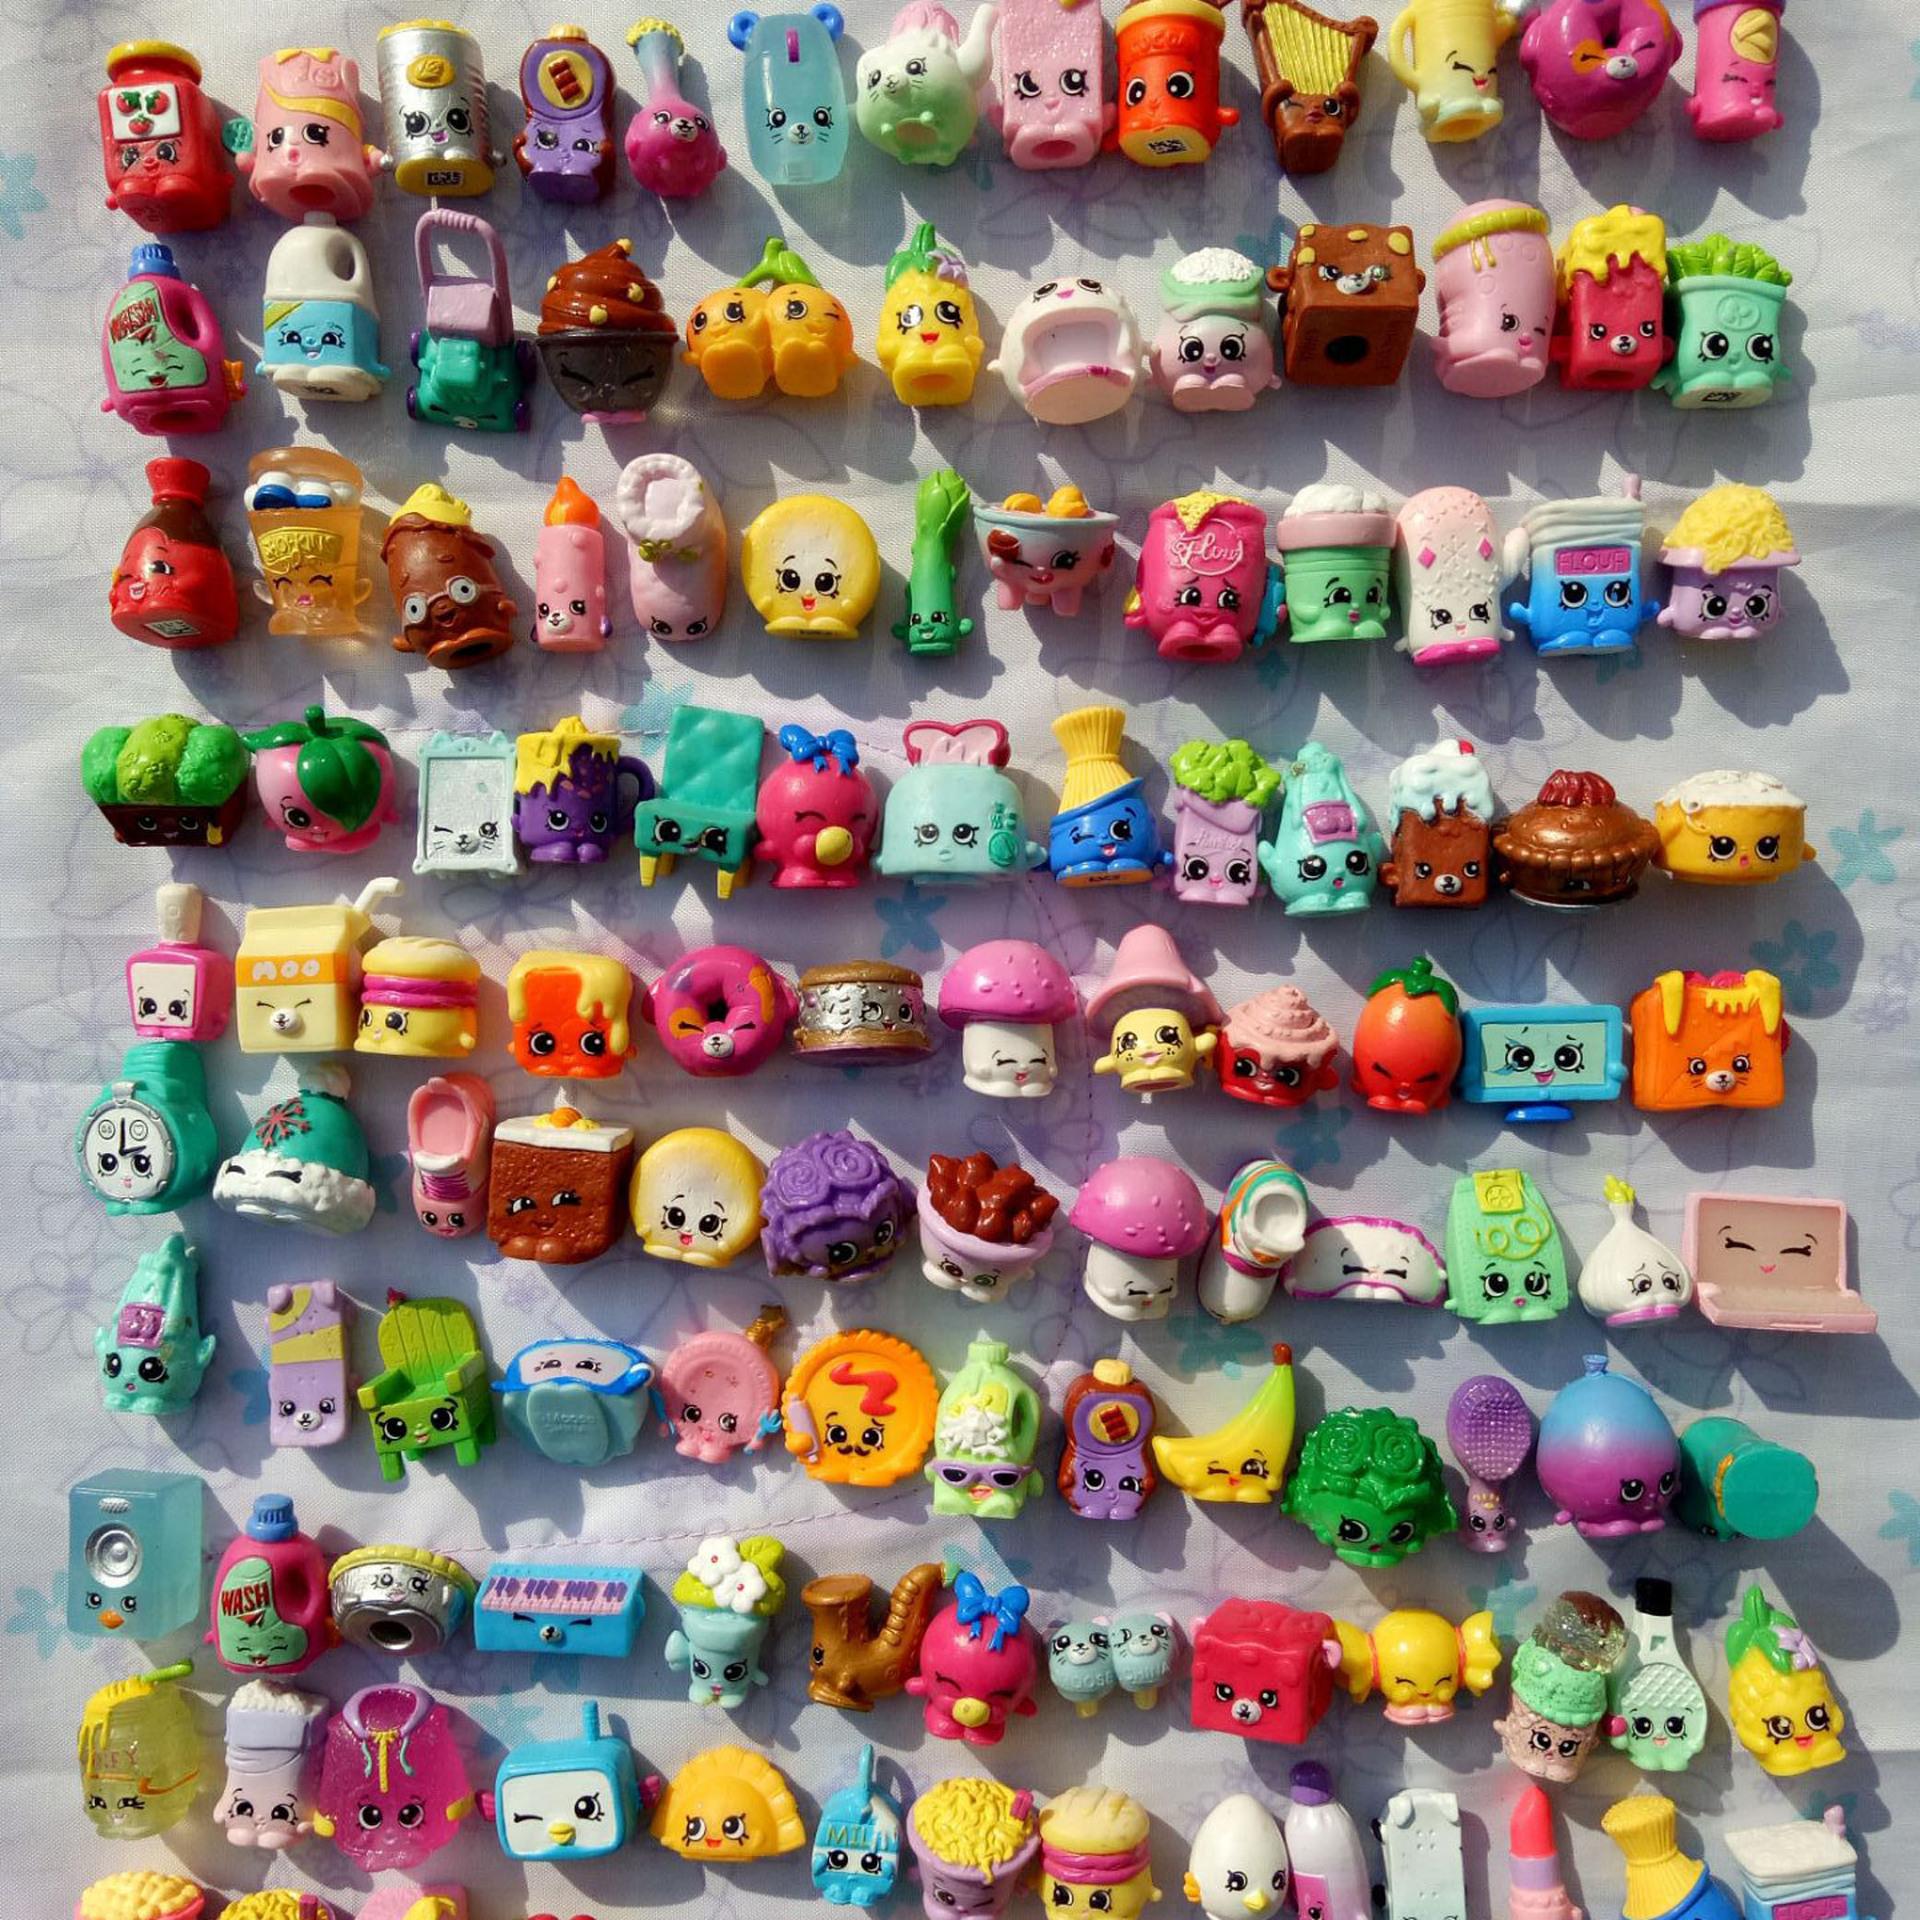 PVC塑胶过家家儿童玩具 水果人摆件扭蛋公仔玩偶礼品收藏